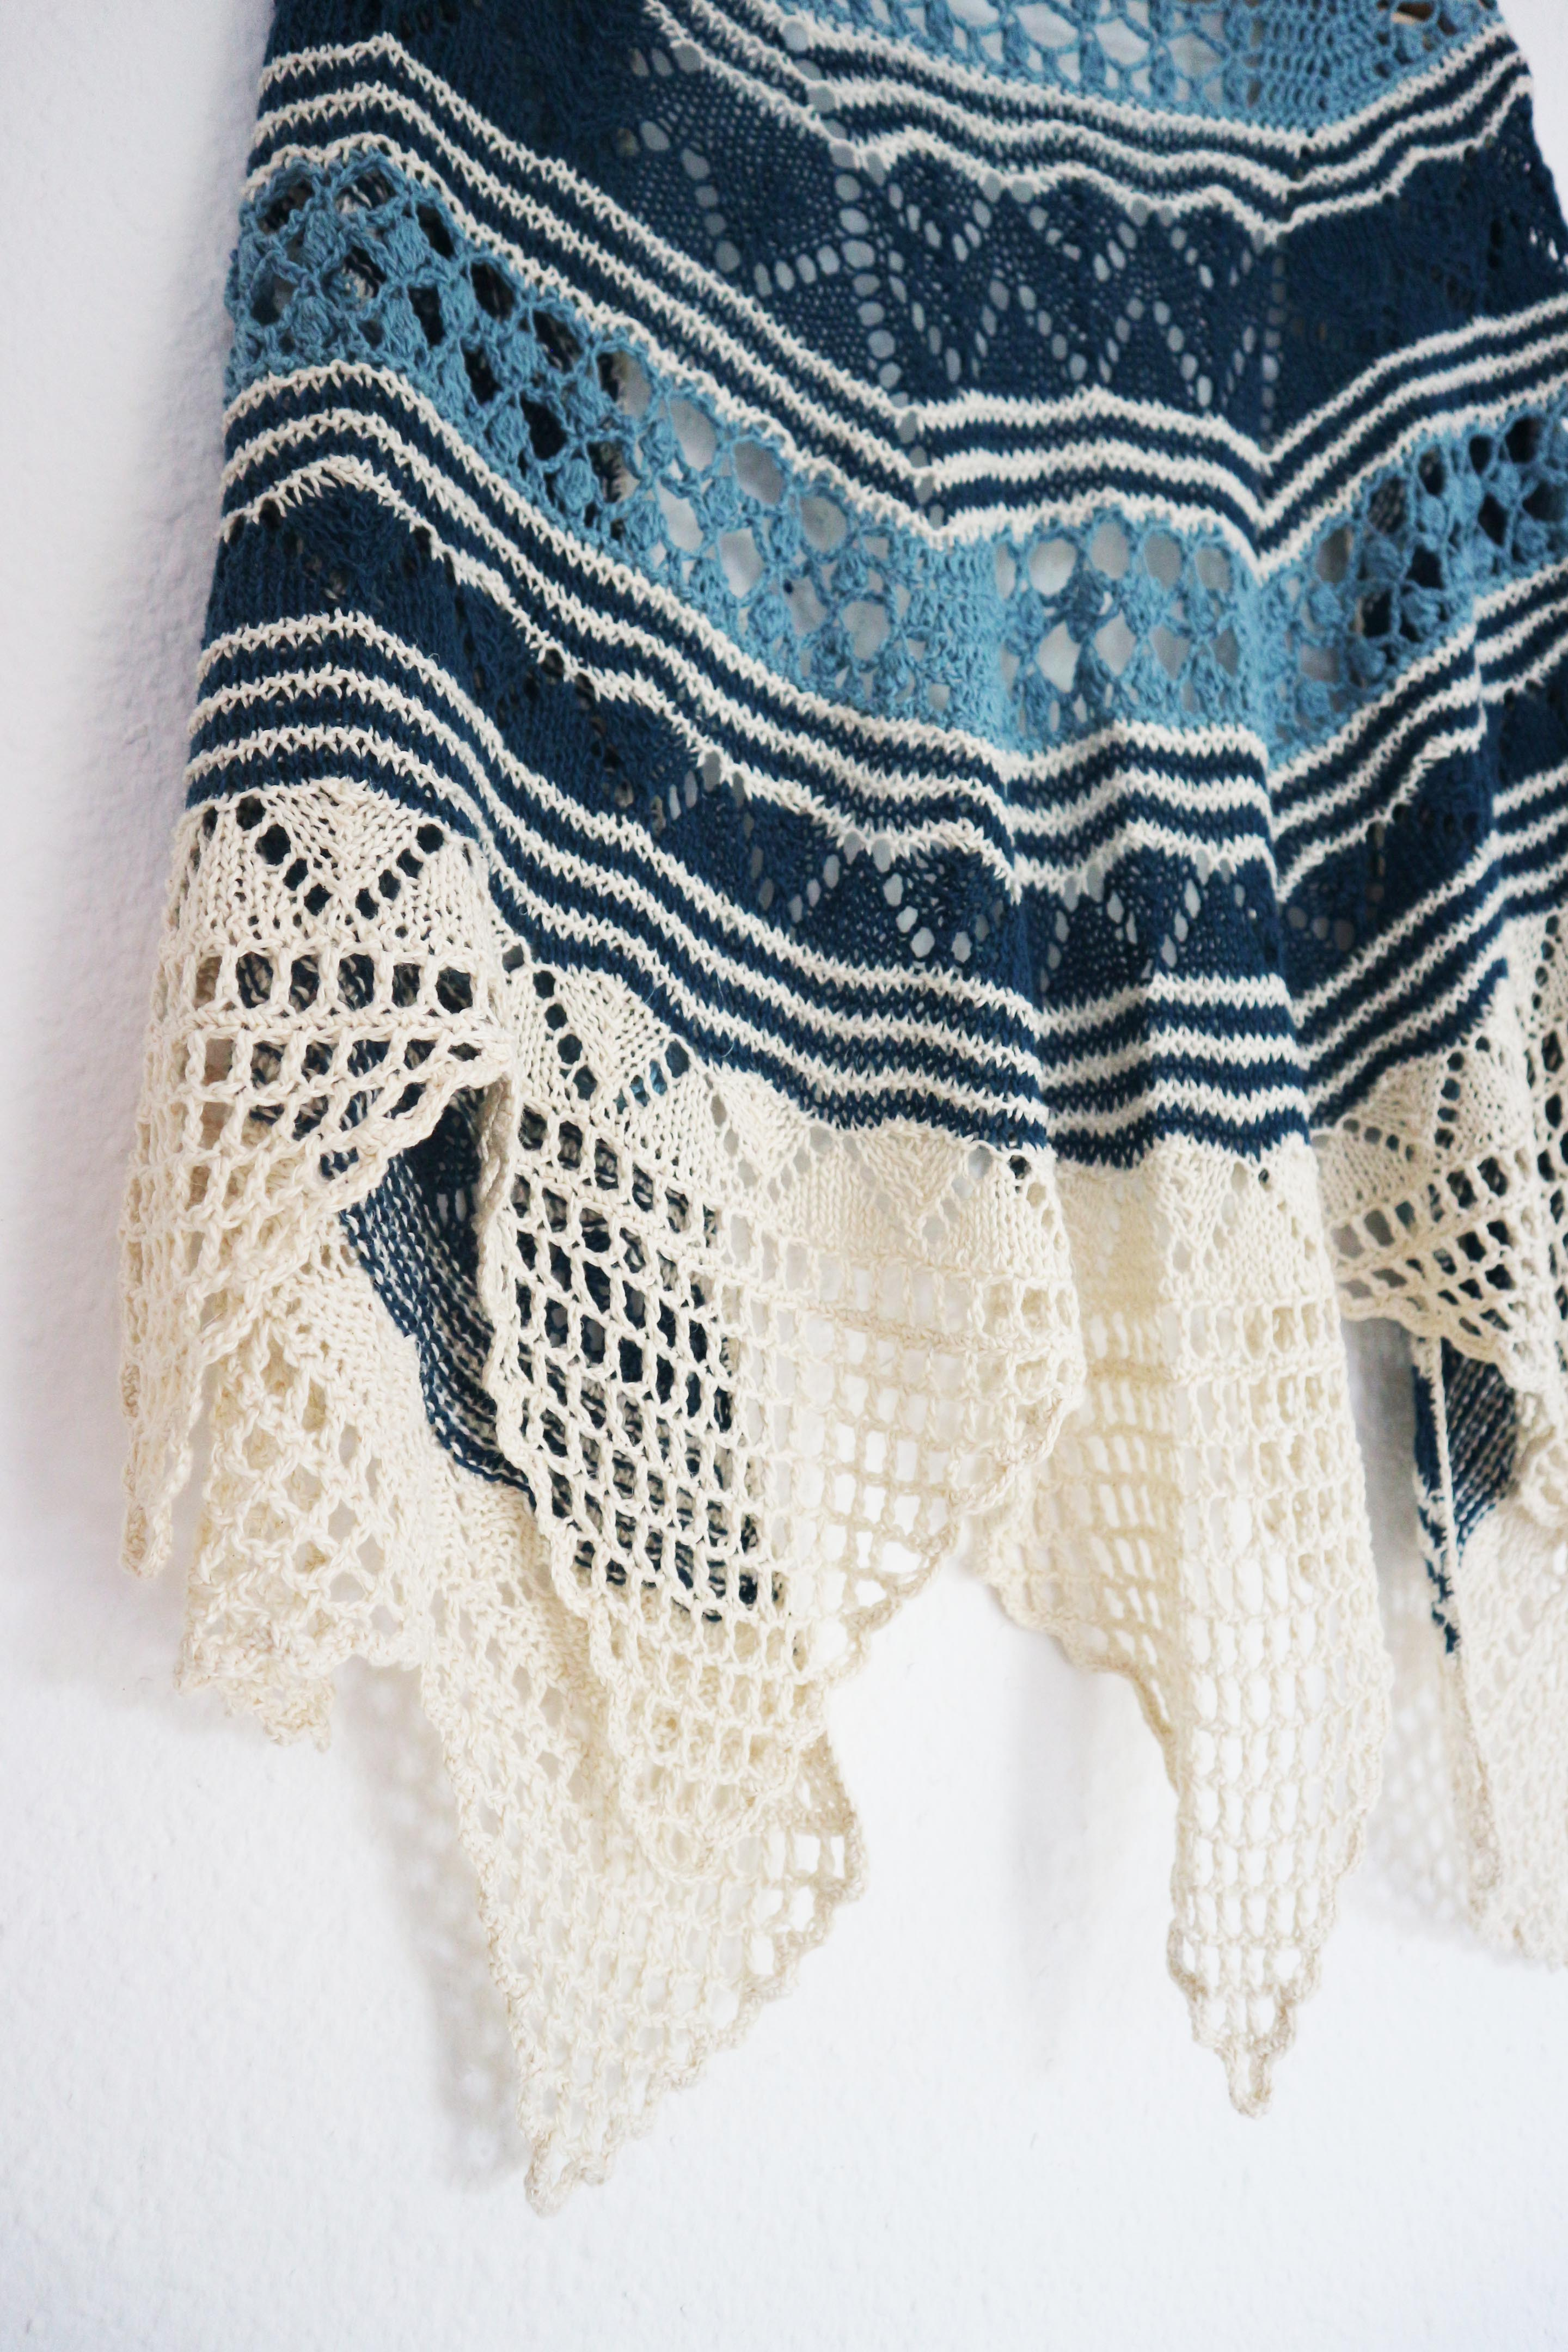 alquimia de hilos mammadiypatterns chal crochet